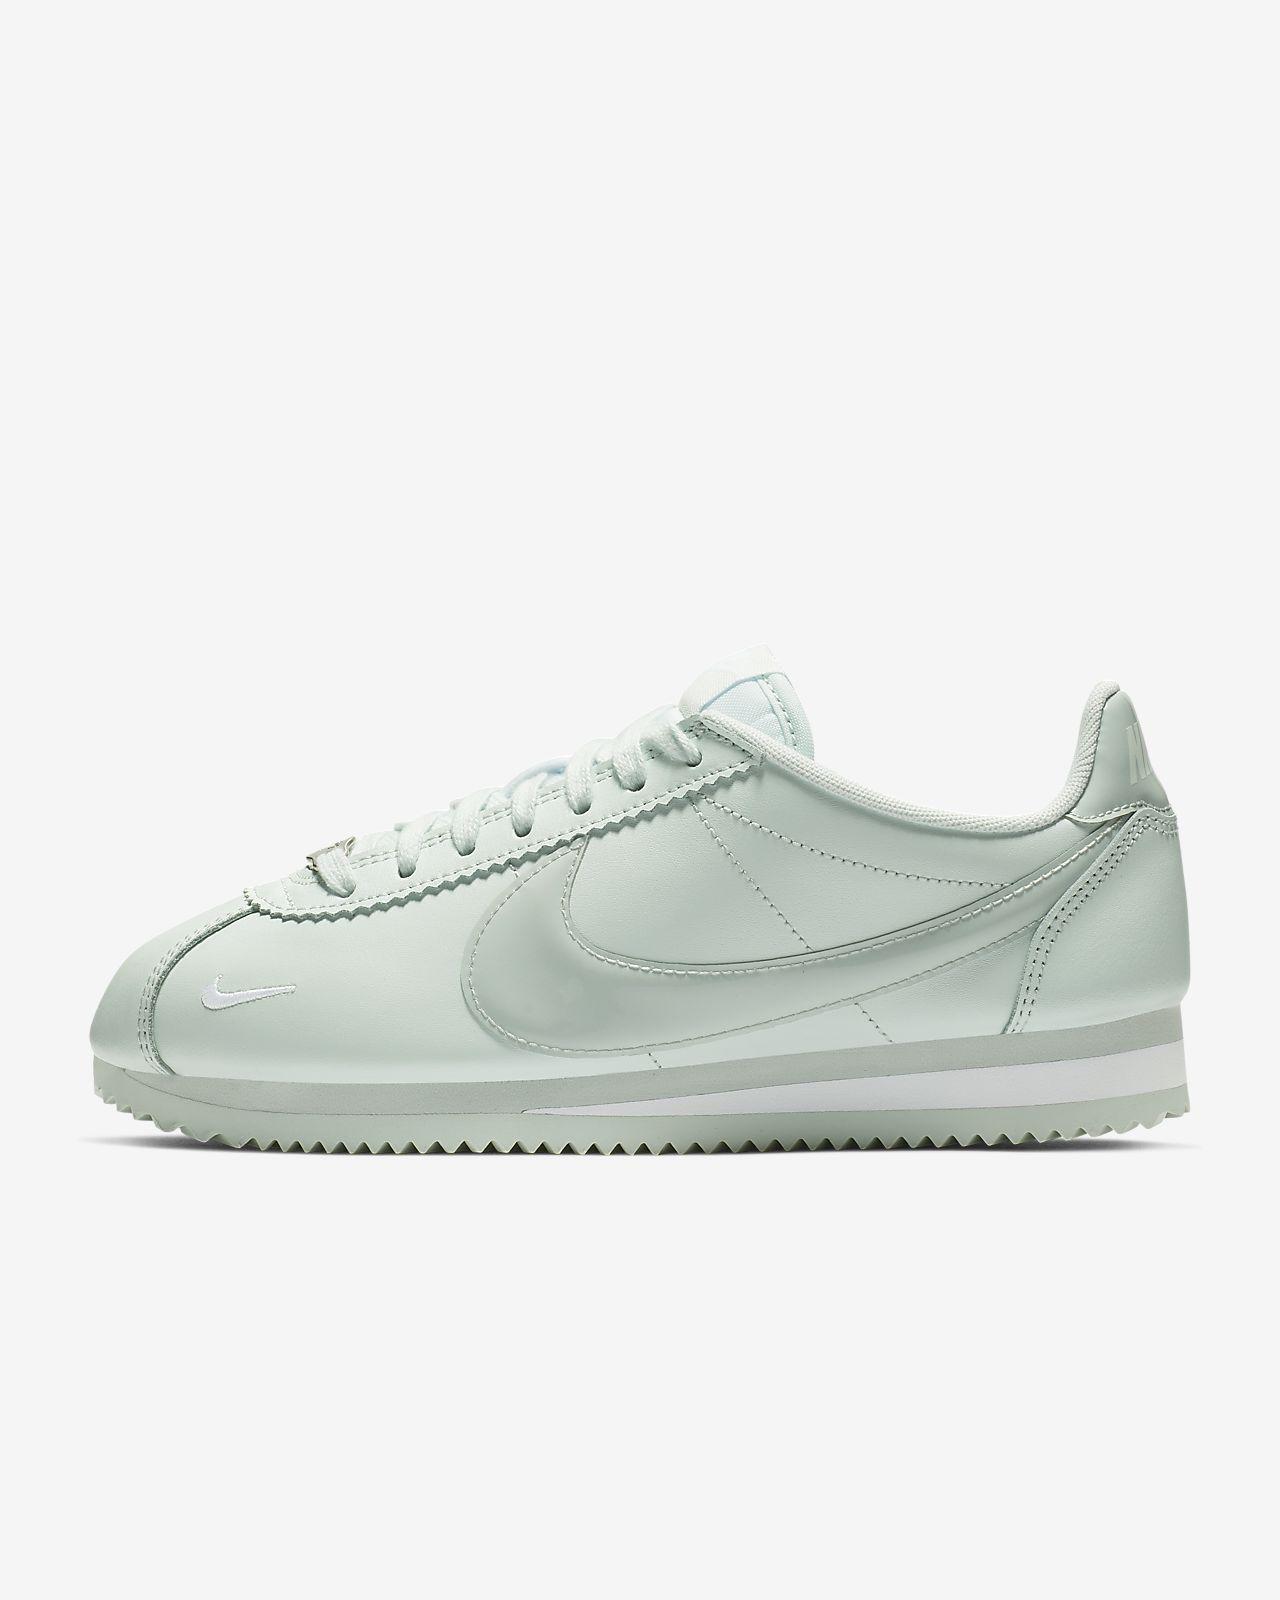 45eafdb1c522 Nike Classic Cortez Premium Women s Shoe. Nike.com CA